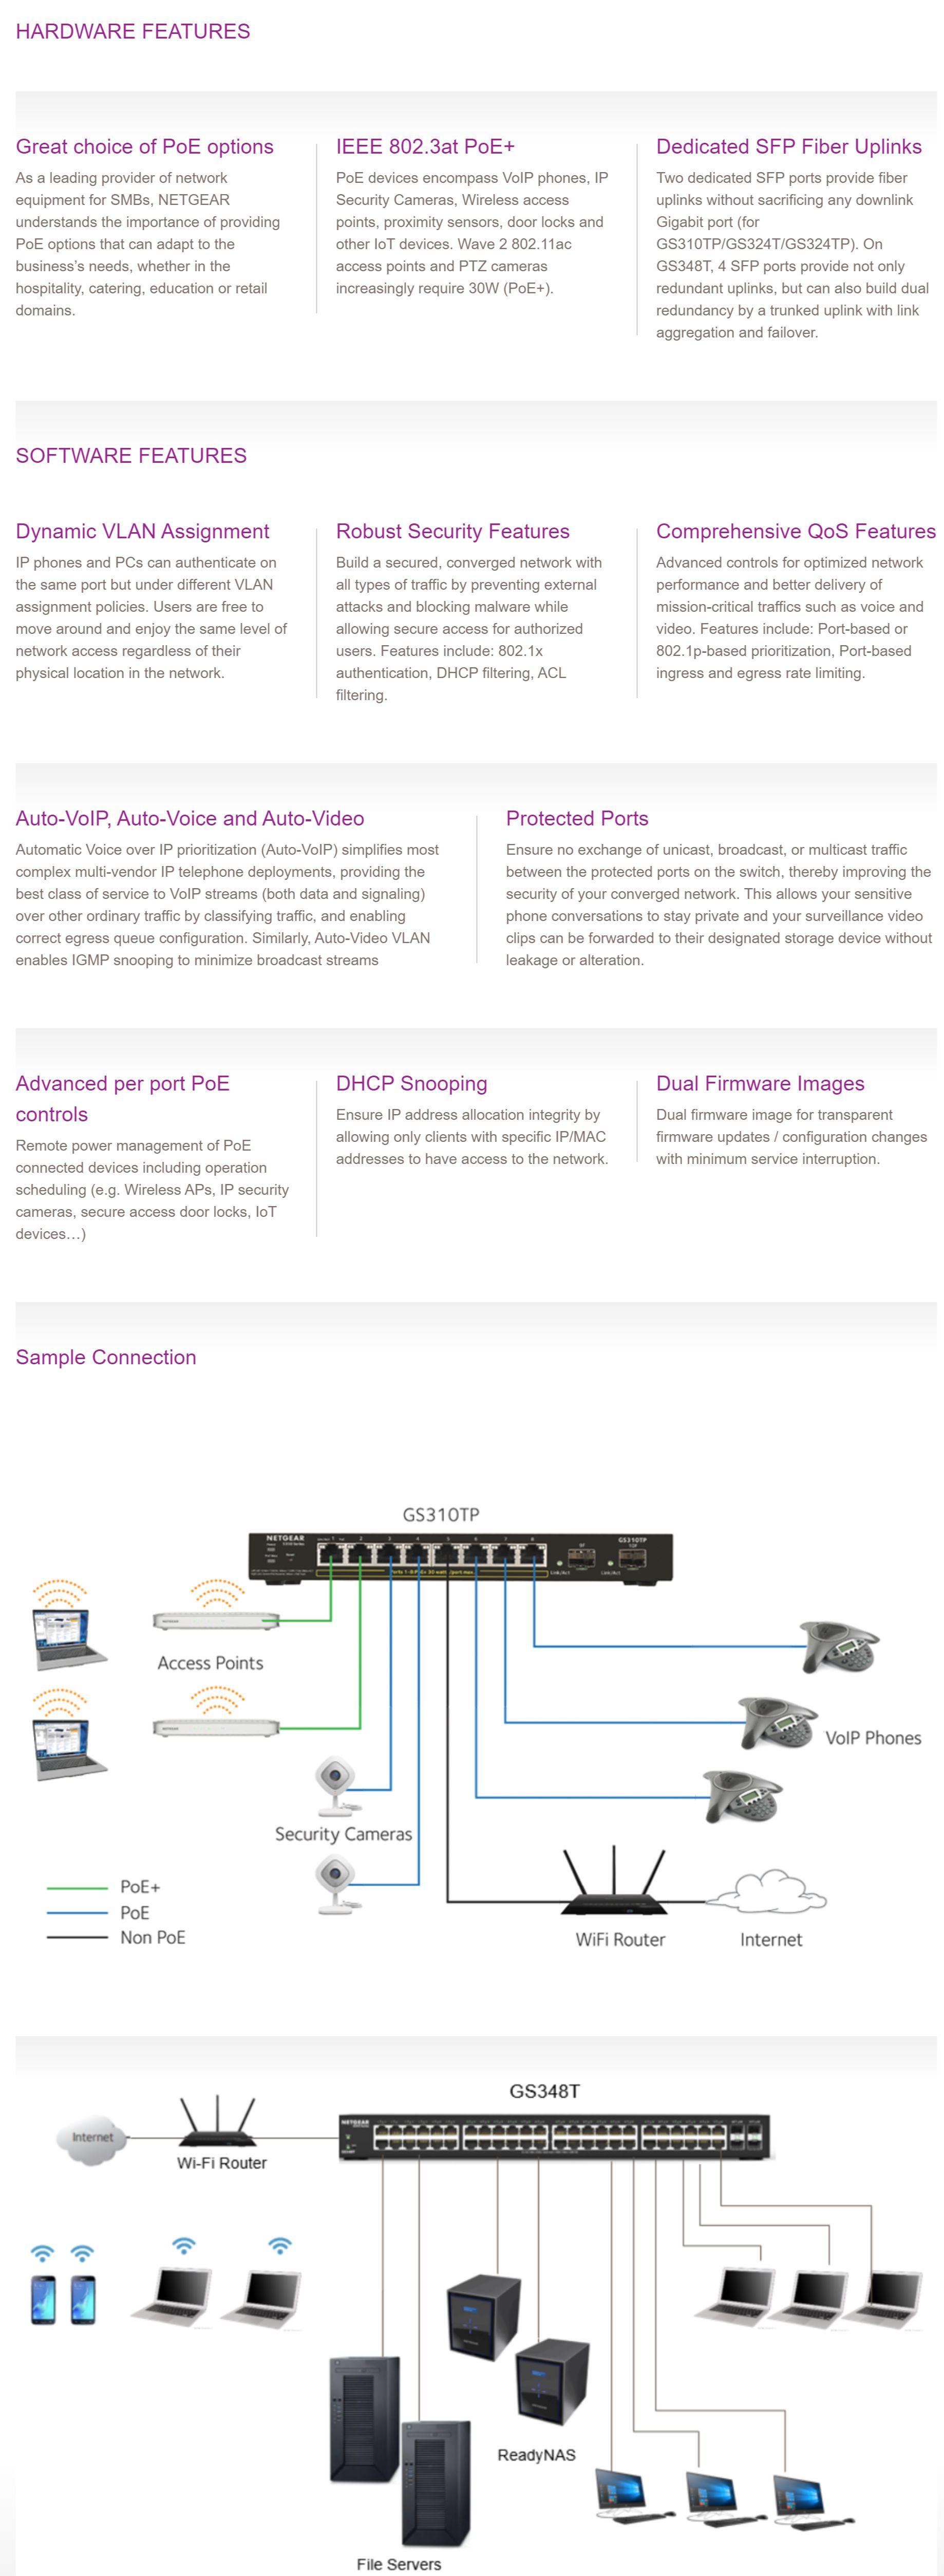 #1649 - 'S350 Smart Managed Pro Switches Series - GS308T I Smart Managed Pro Switches I Switches I Business I NETGEAR' - www_netgear_com.jpg